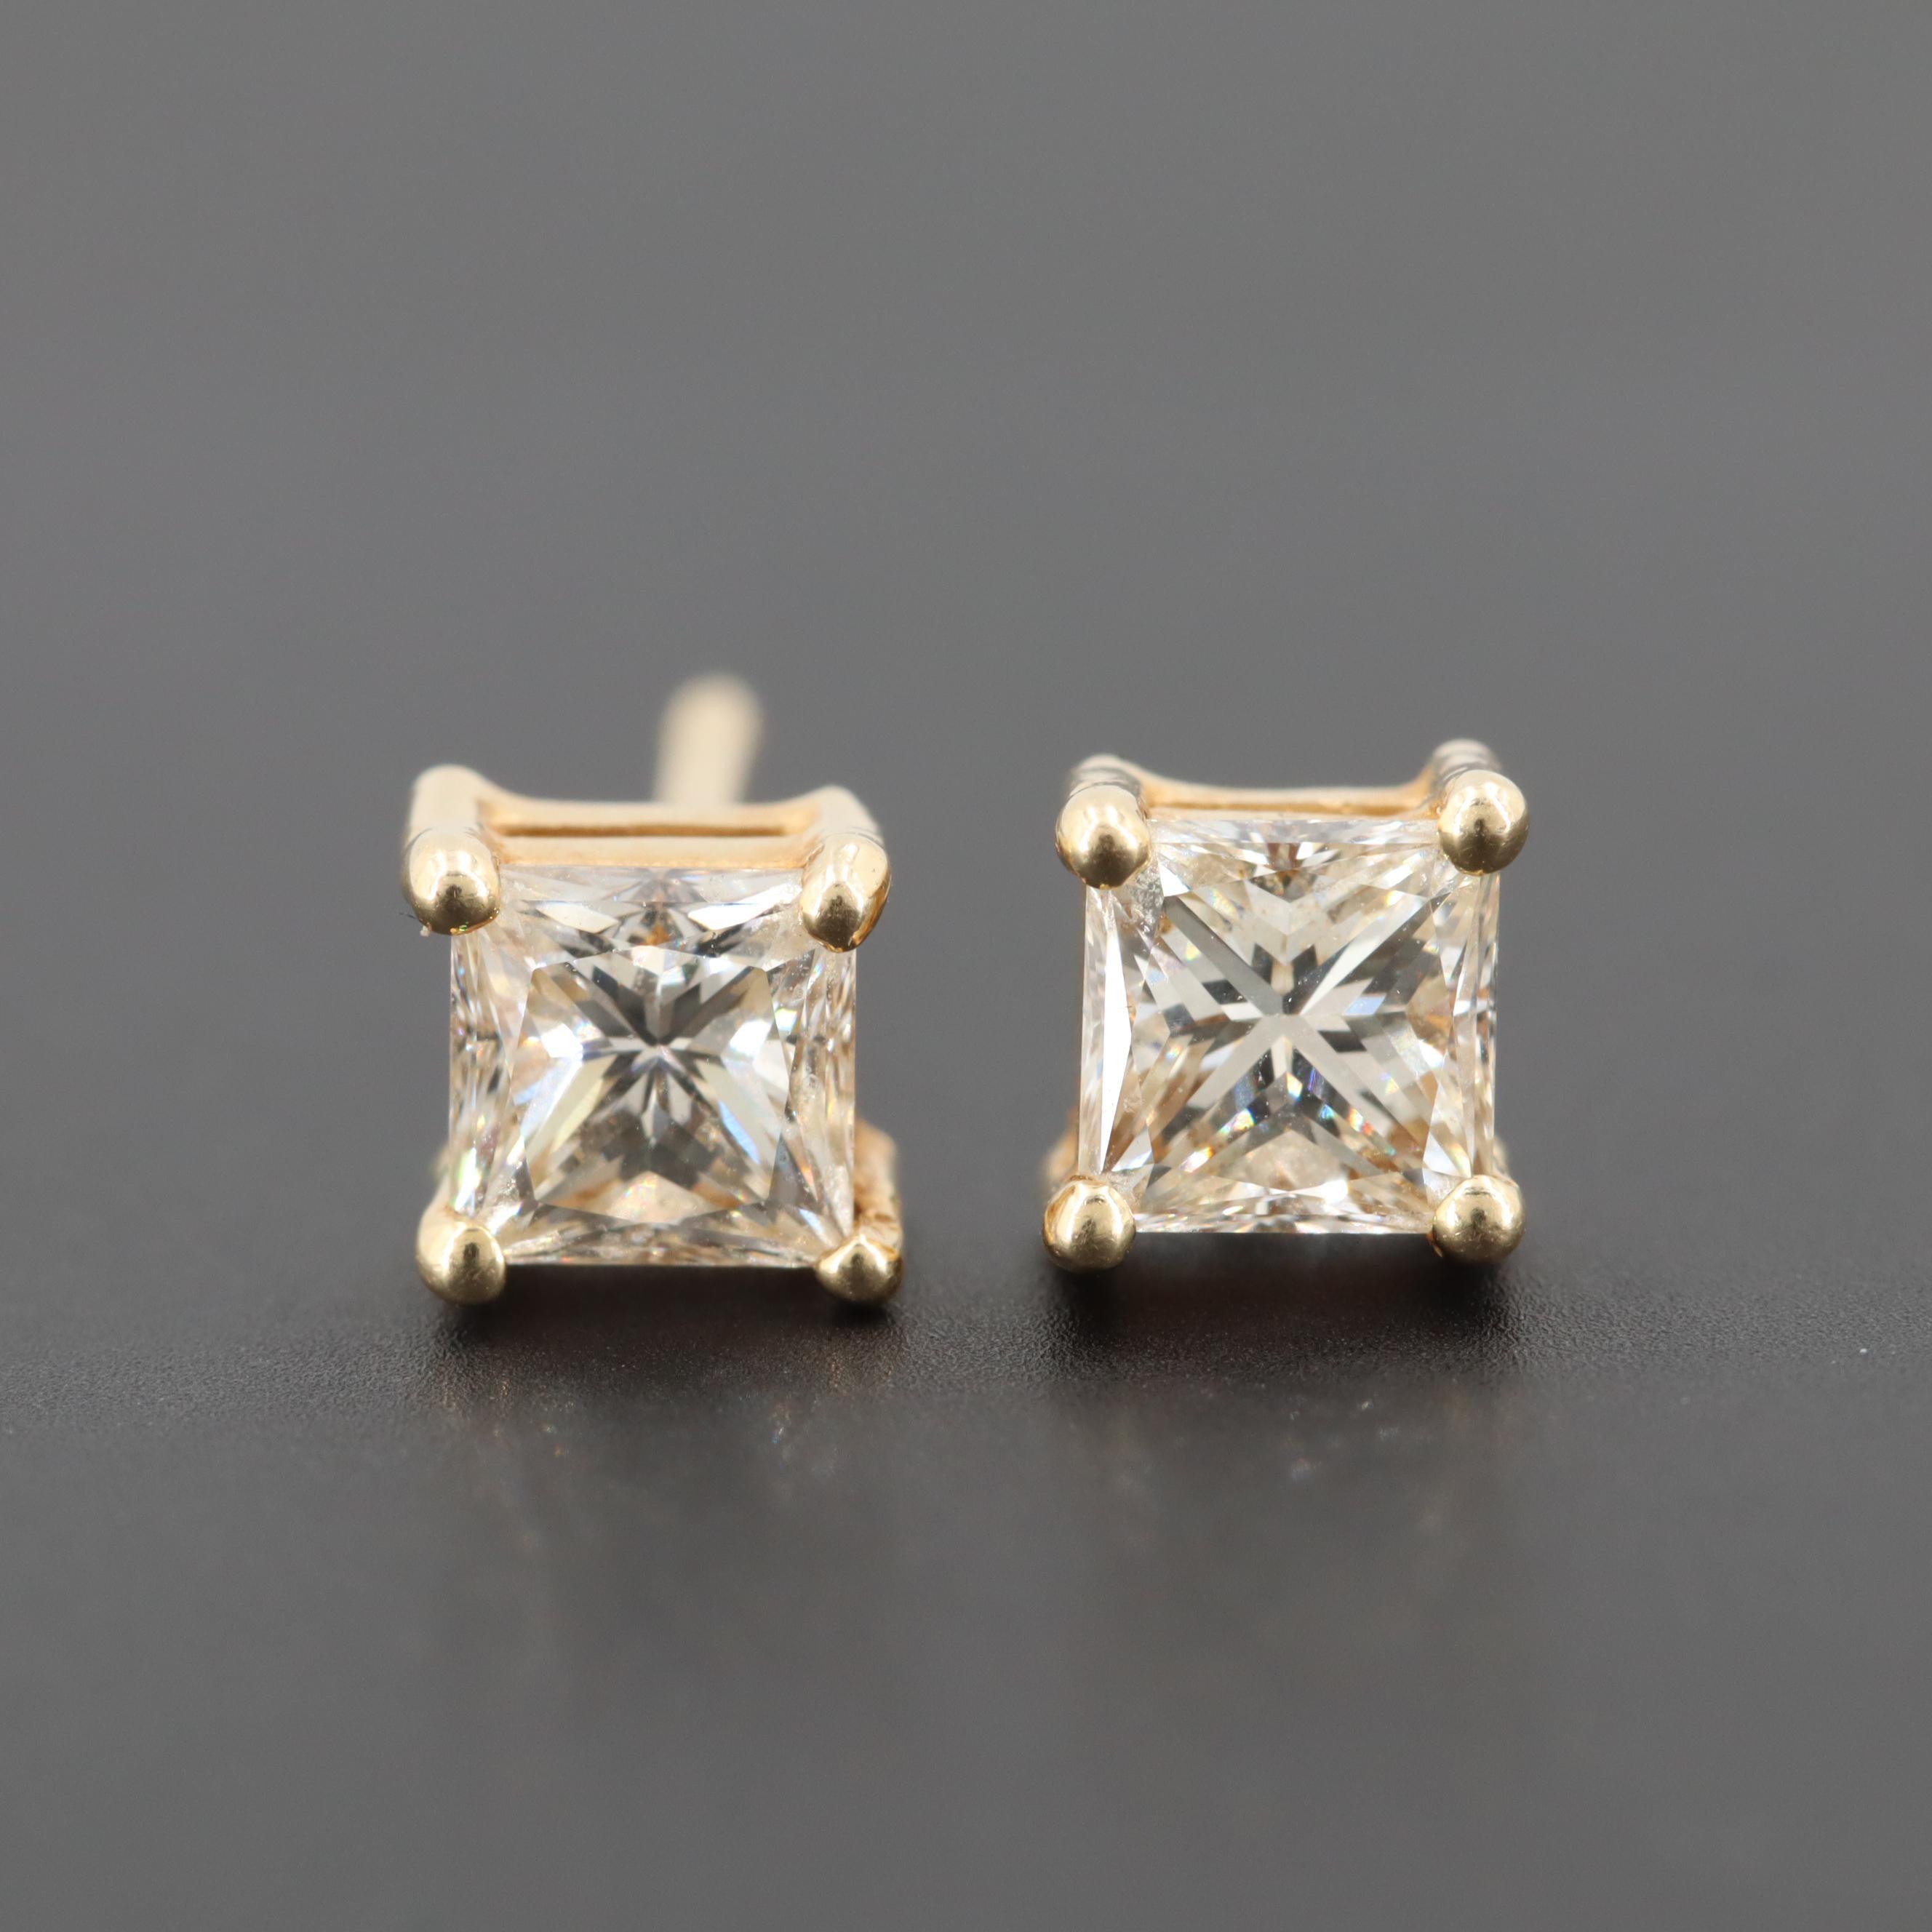 14K Yellow Gold 1.00 CT Diamond Stud Earrings